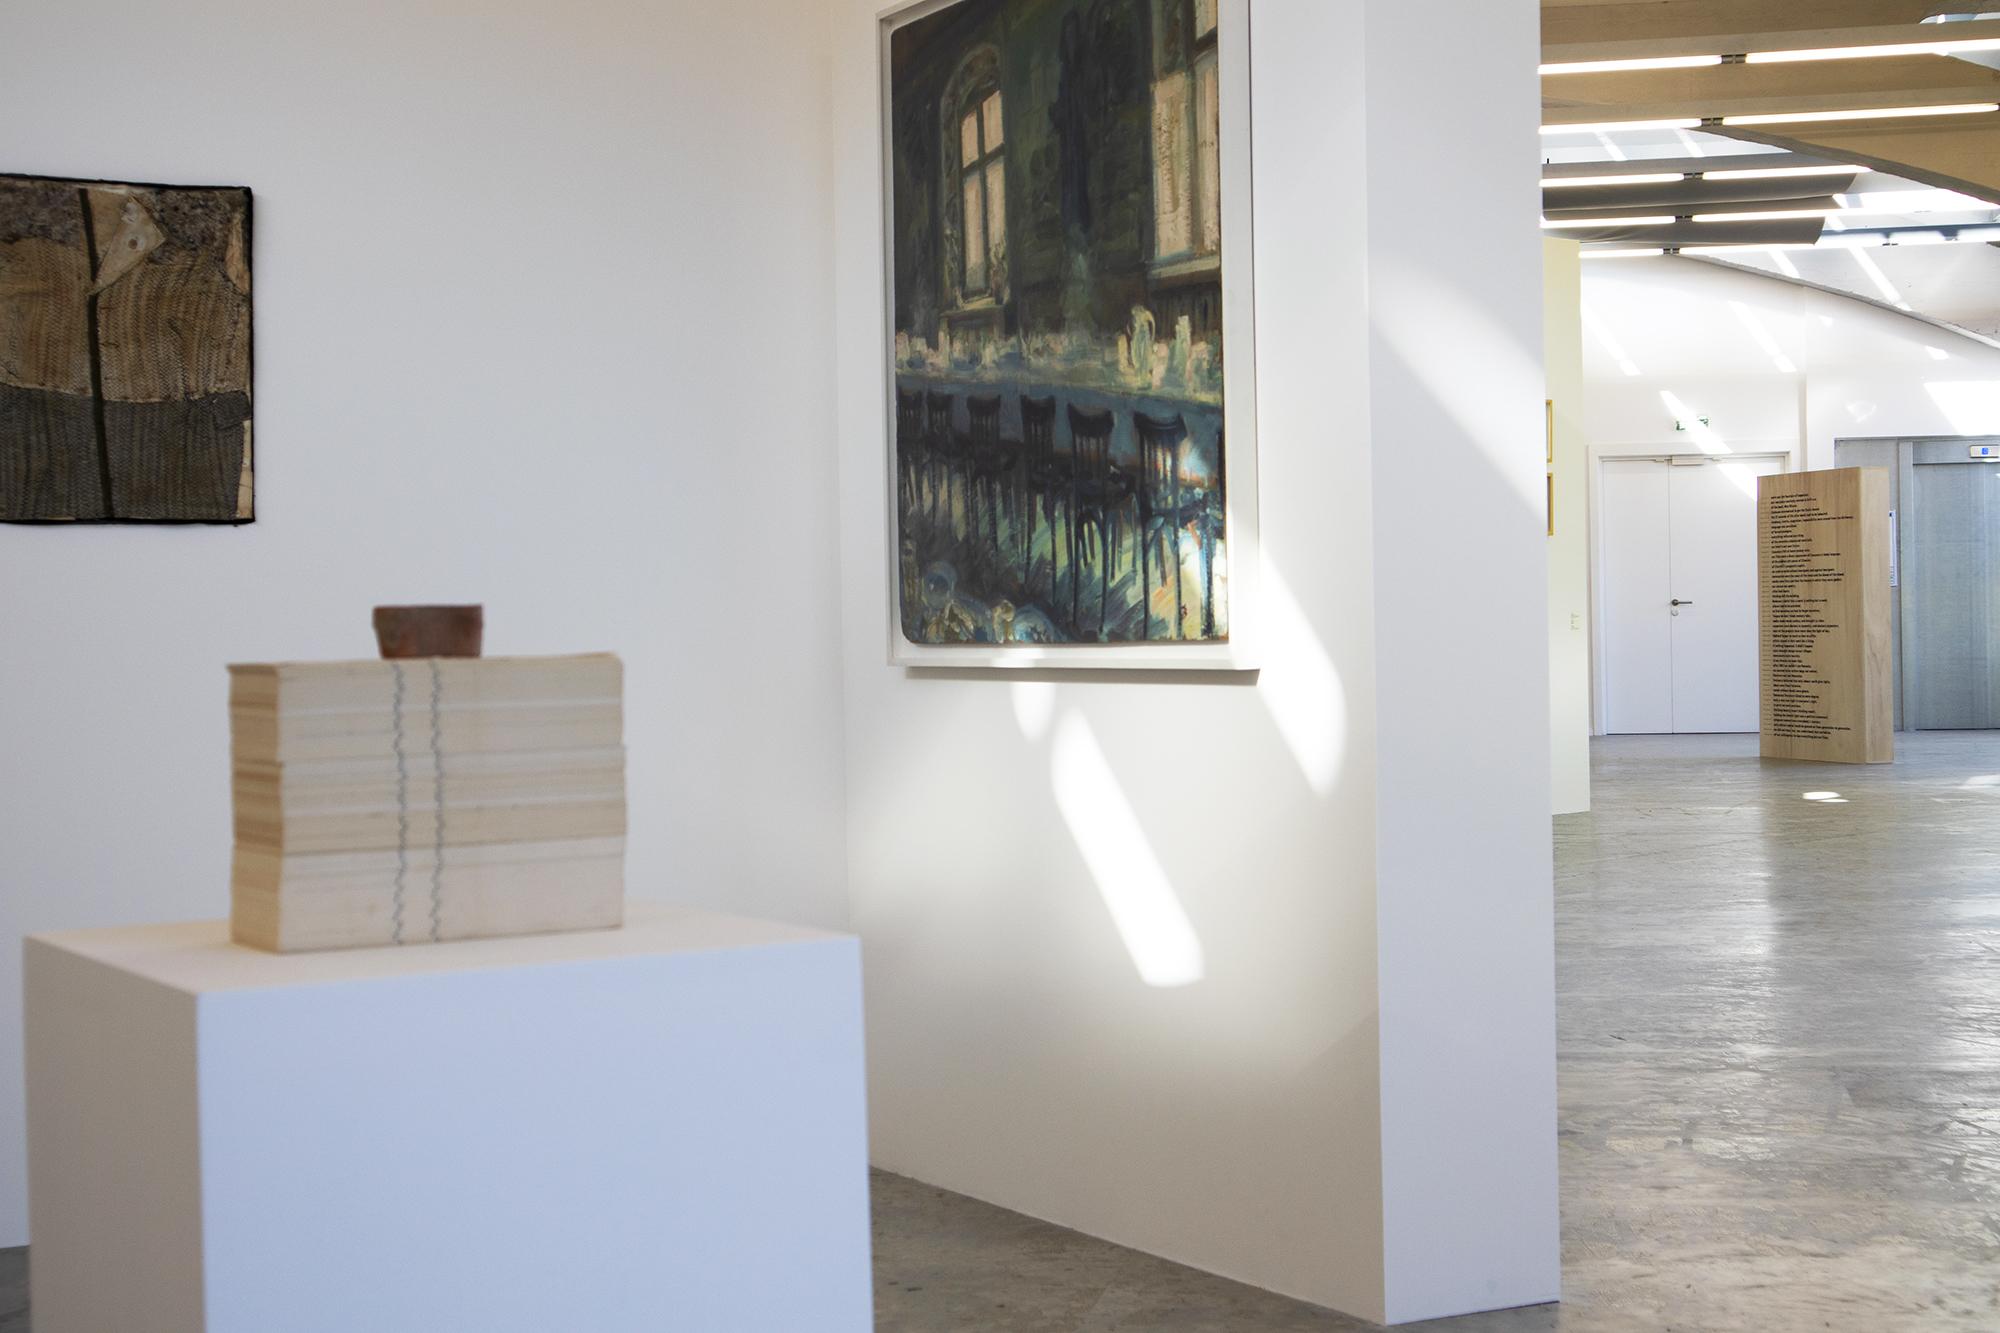 Alex-Mirutziu-Because-Kunsthalle-Mulhouse-11.jpg